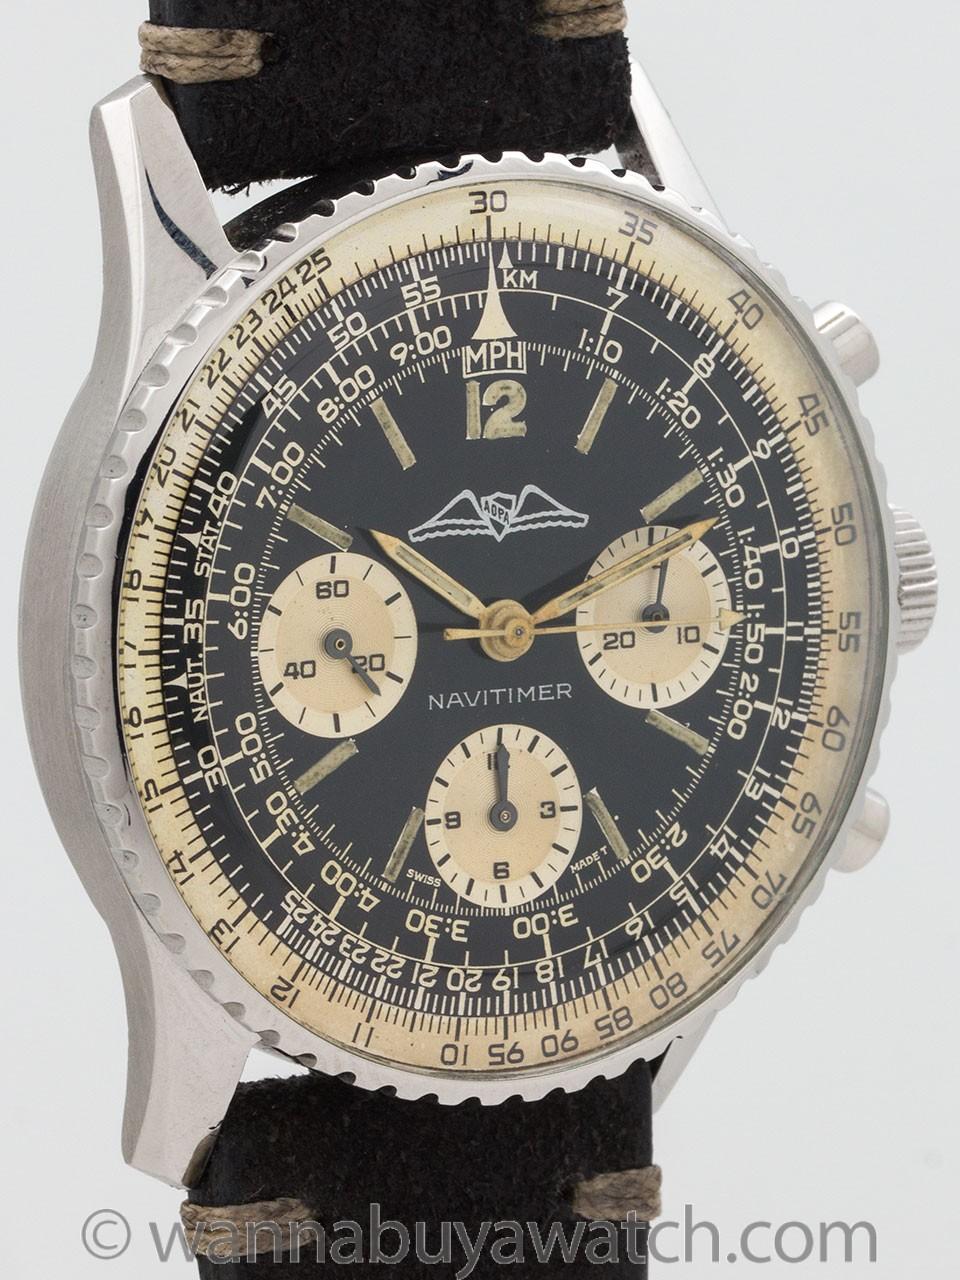 Vintage Breitling Navitimer ref 806 AOPA circa 1966